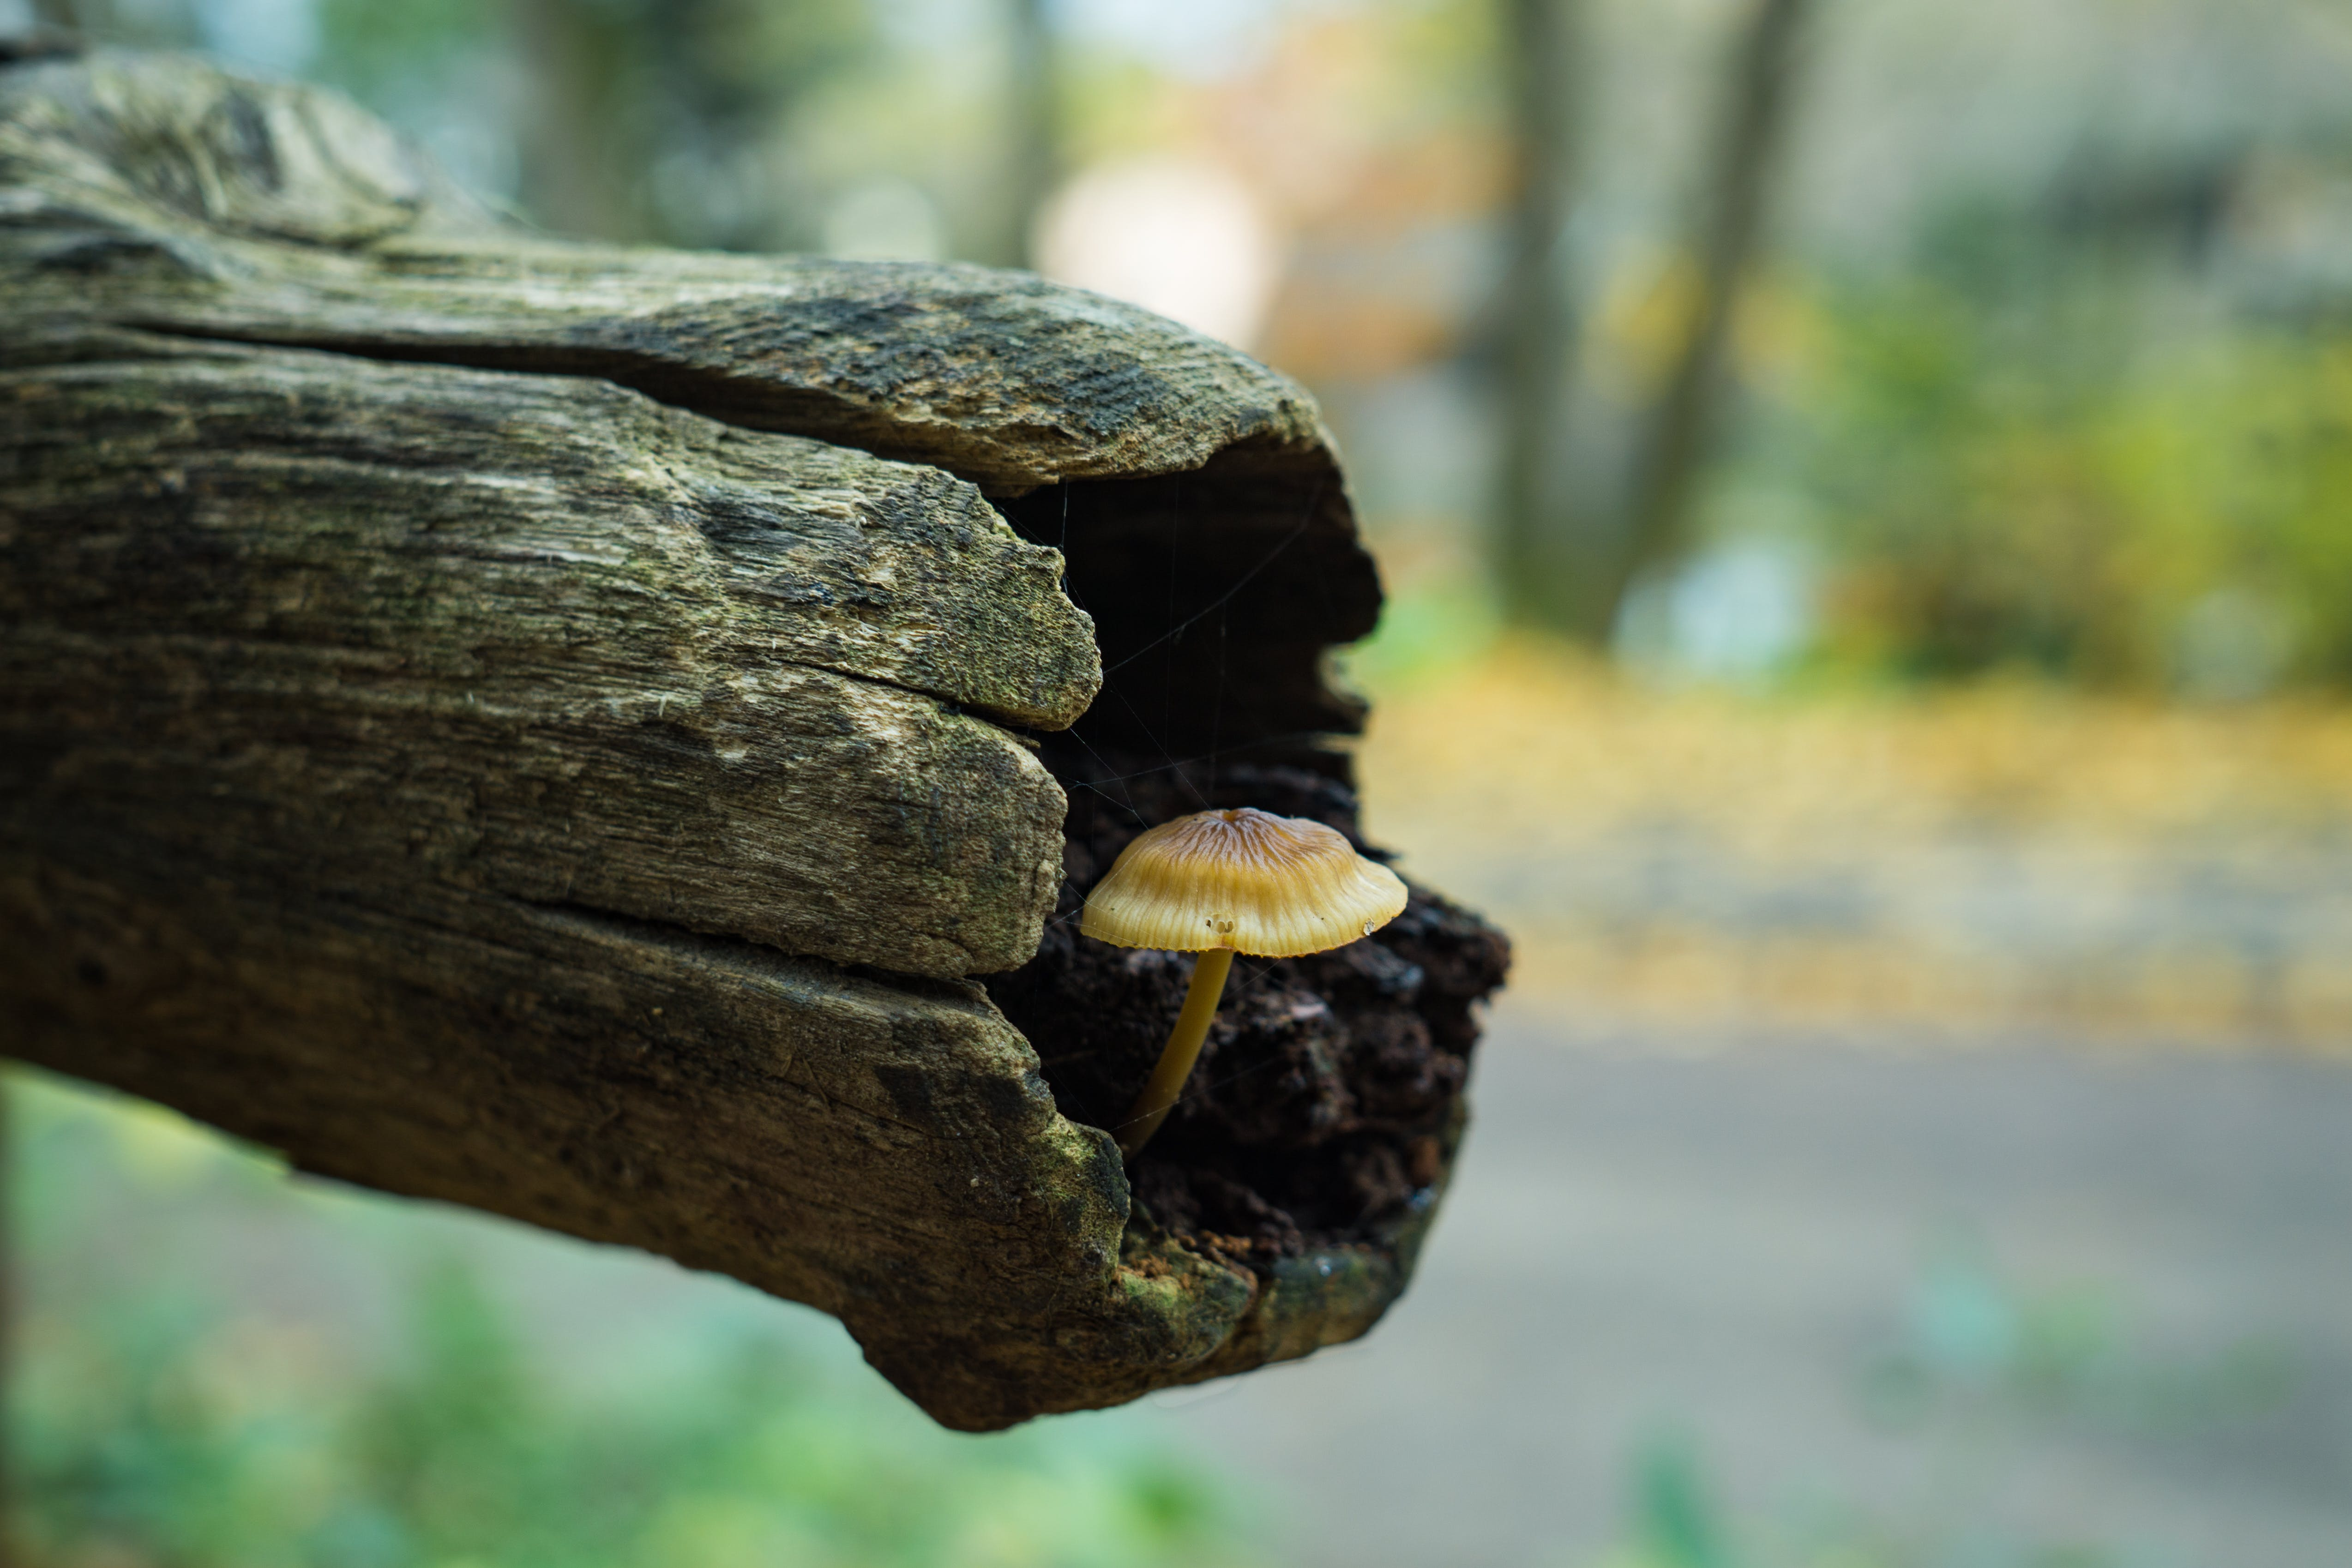 Mushroom in Tree Trunk